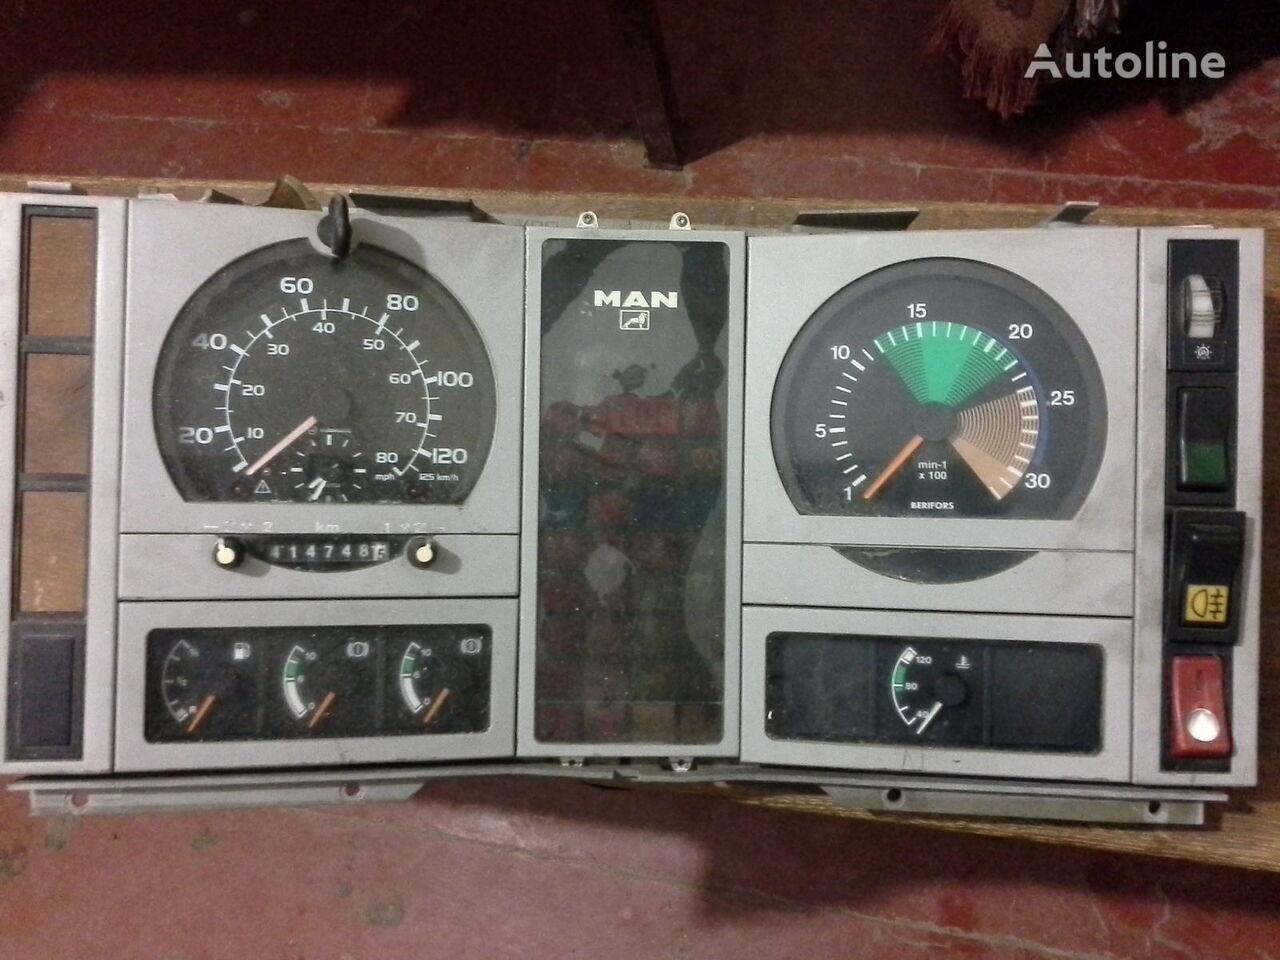 MAN Spidometr Tahometr originalni zapchasti kabini tachograaf voor MAN  L2000 Po zapchastyam vrachtwagen